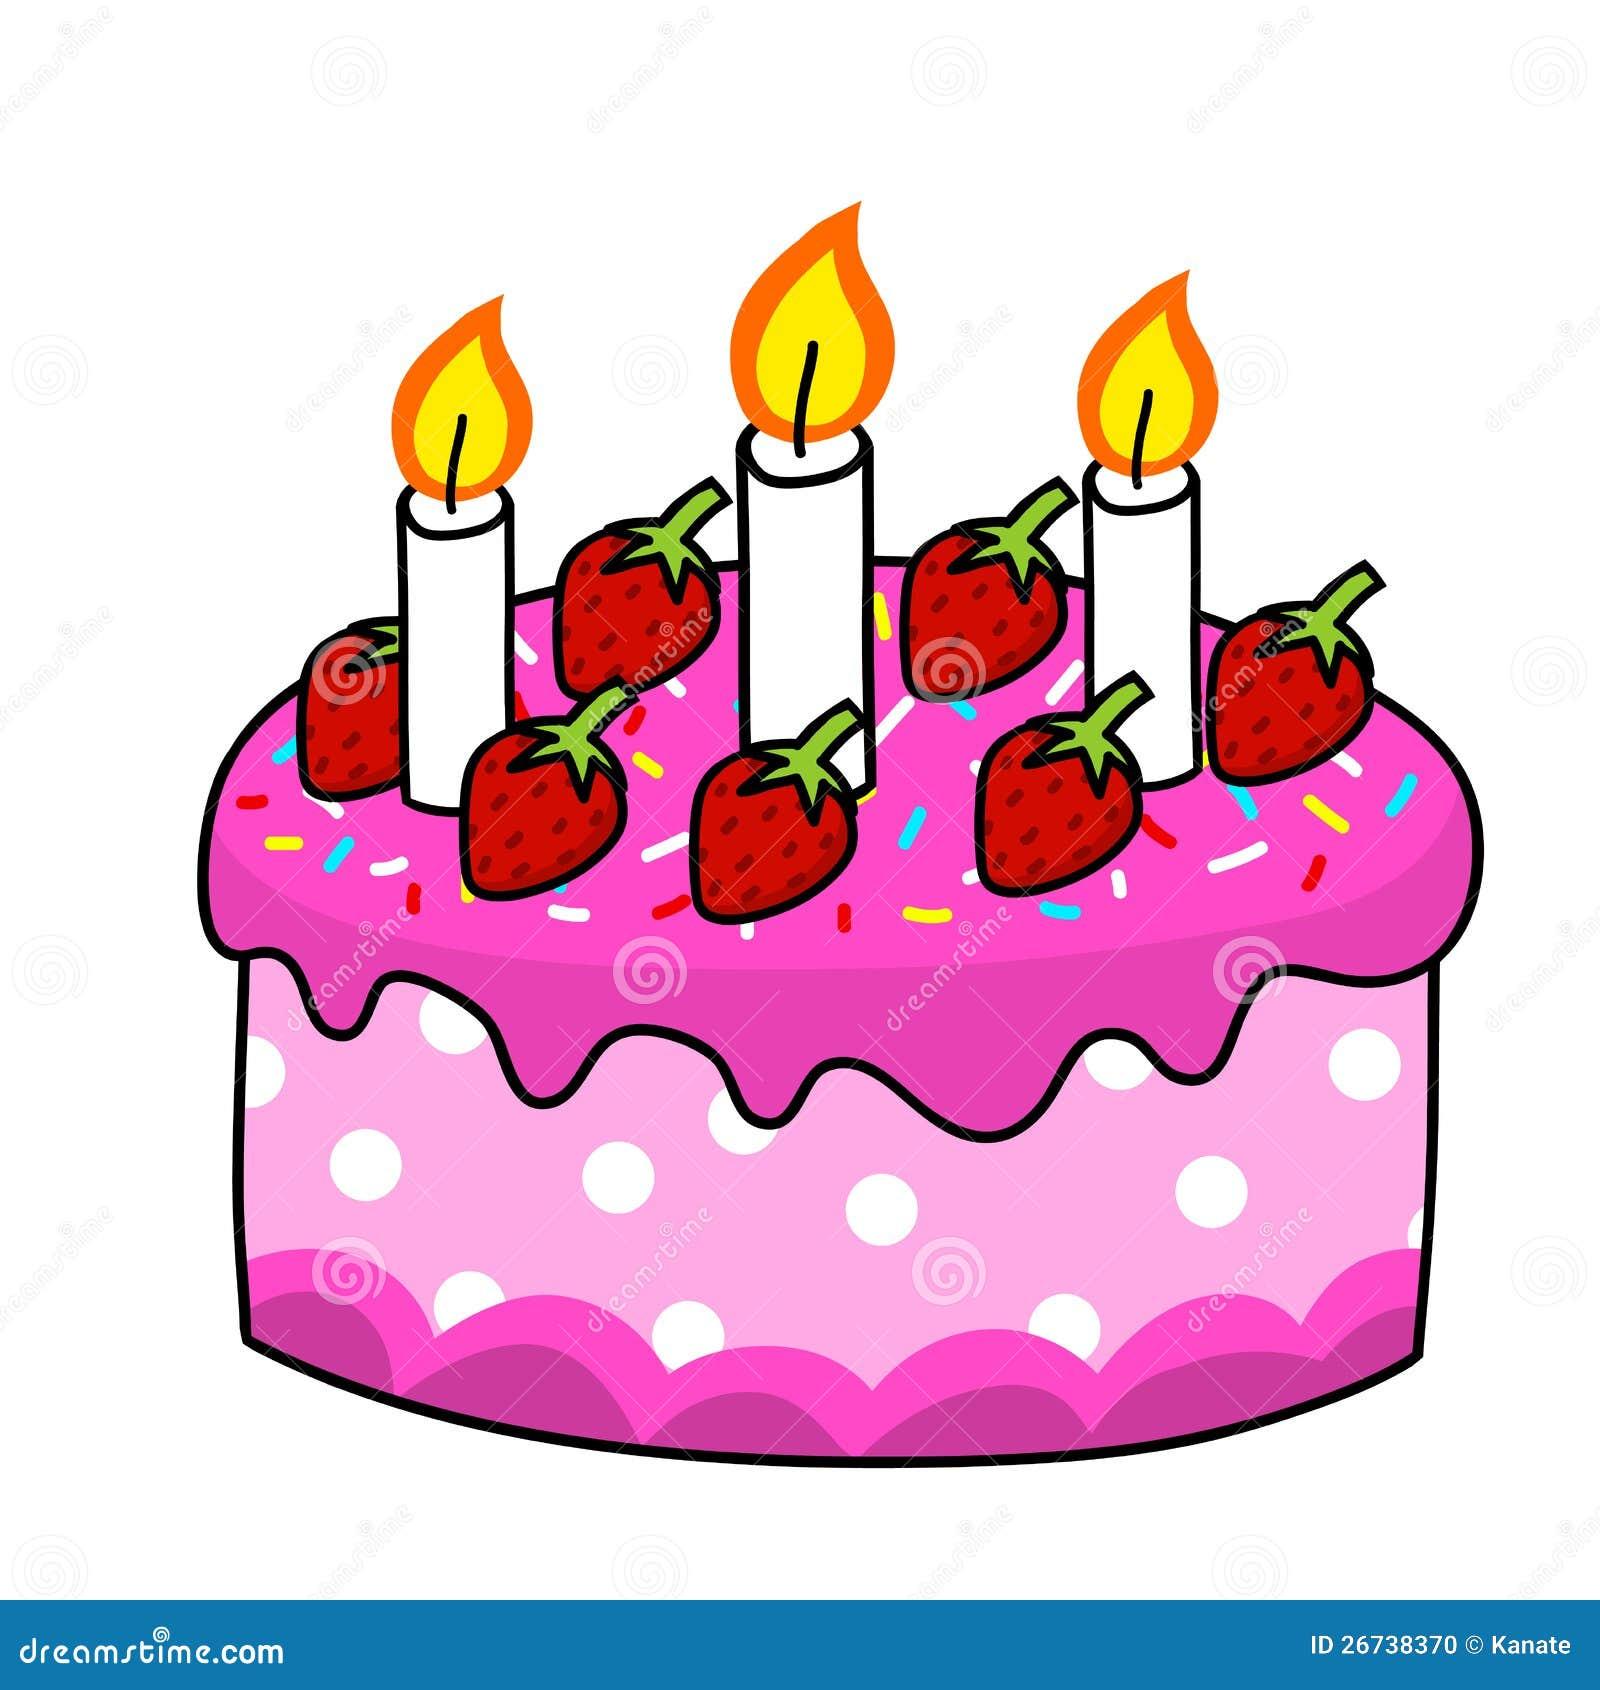 cartoon cake hand drawing stock photo - image: 26738370